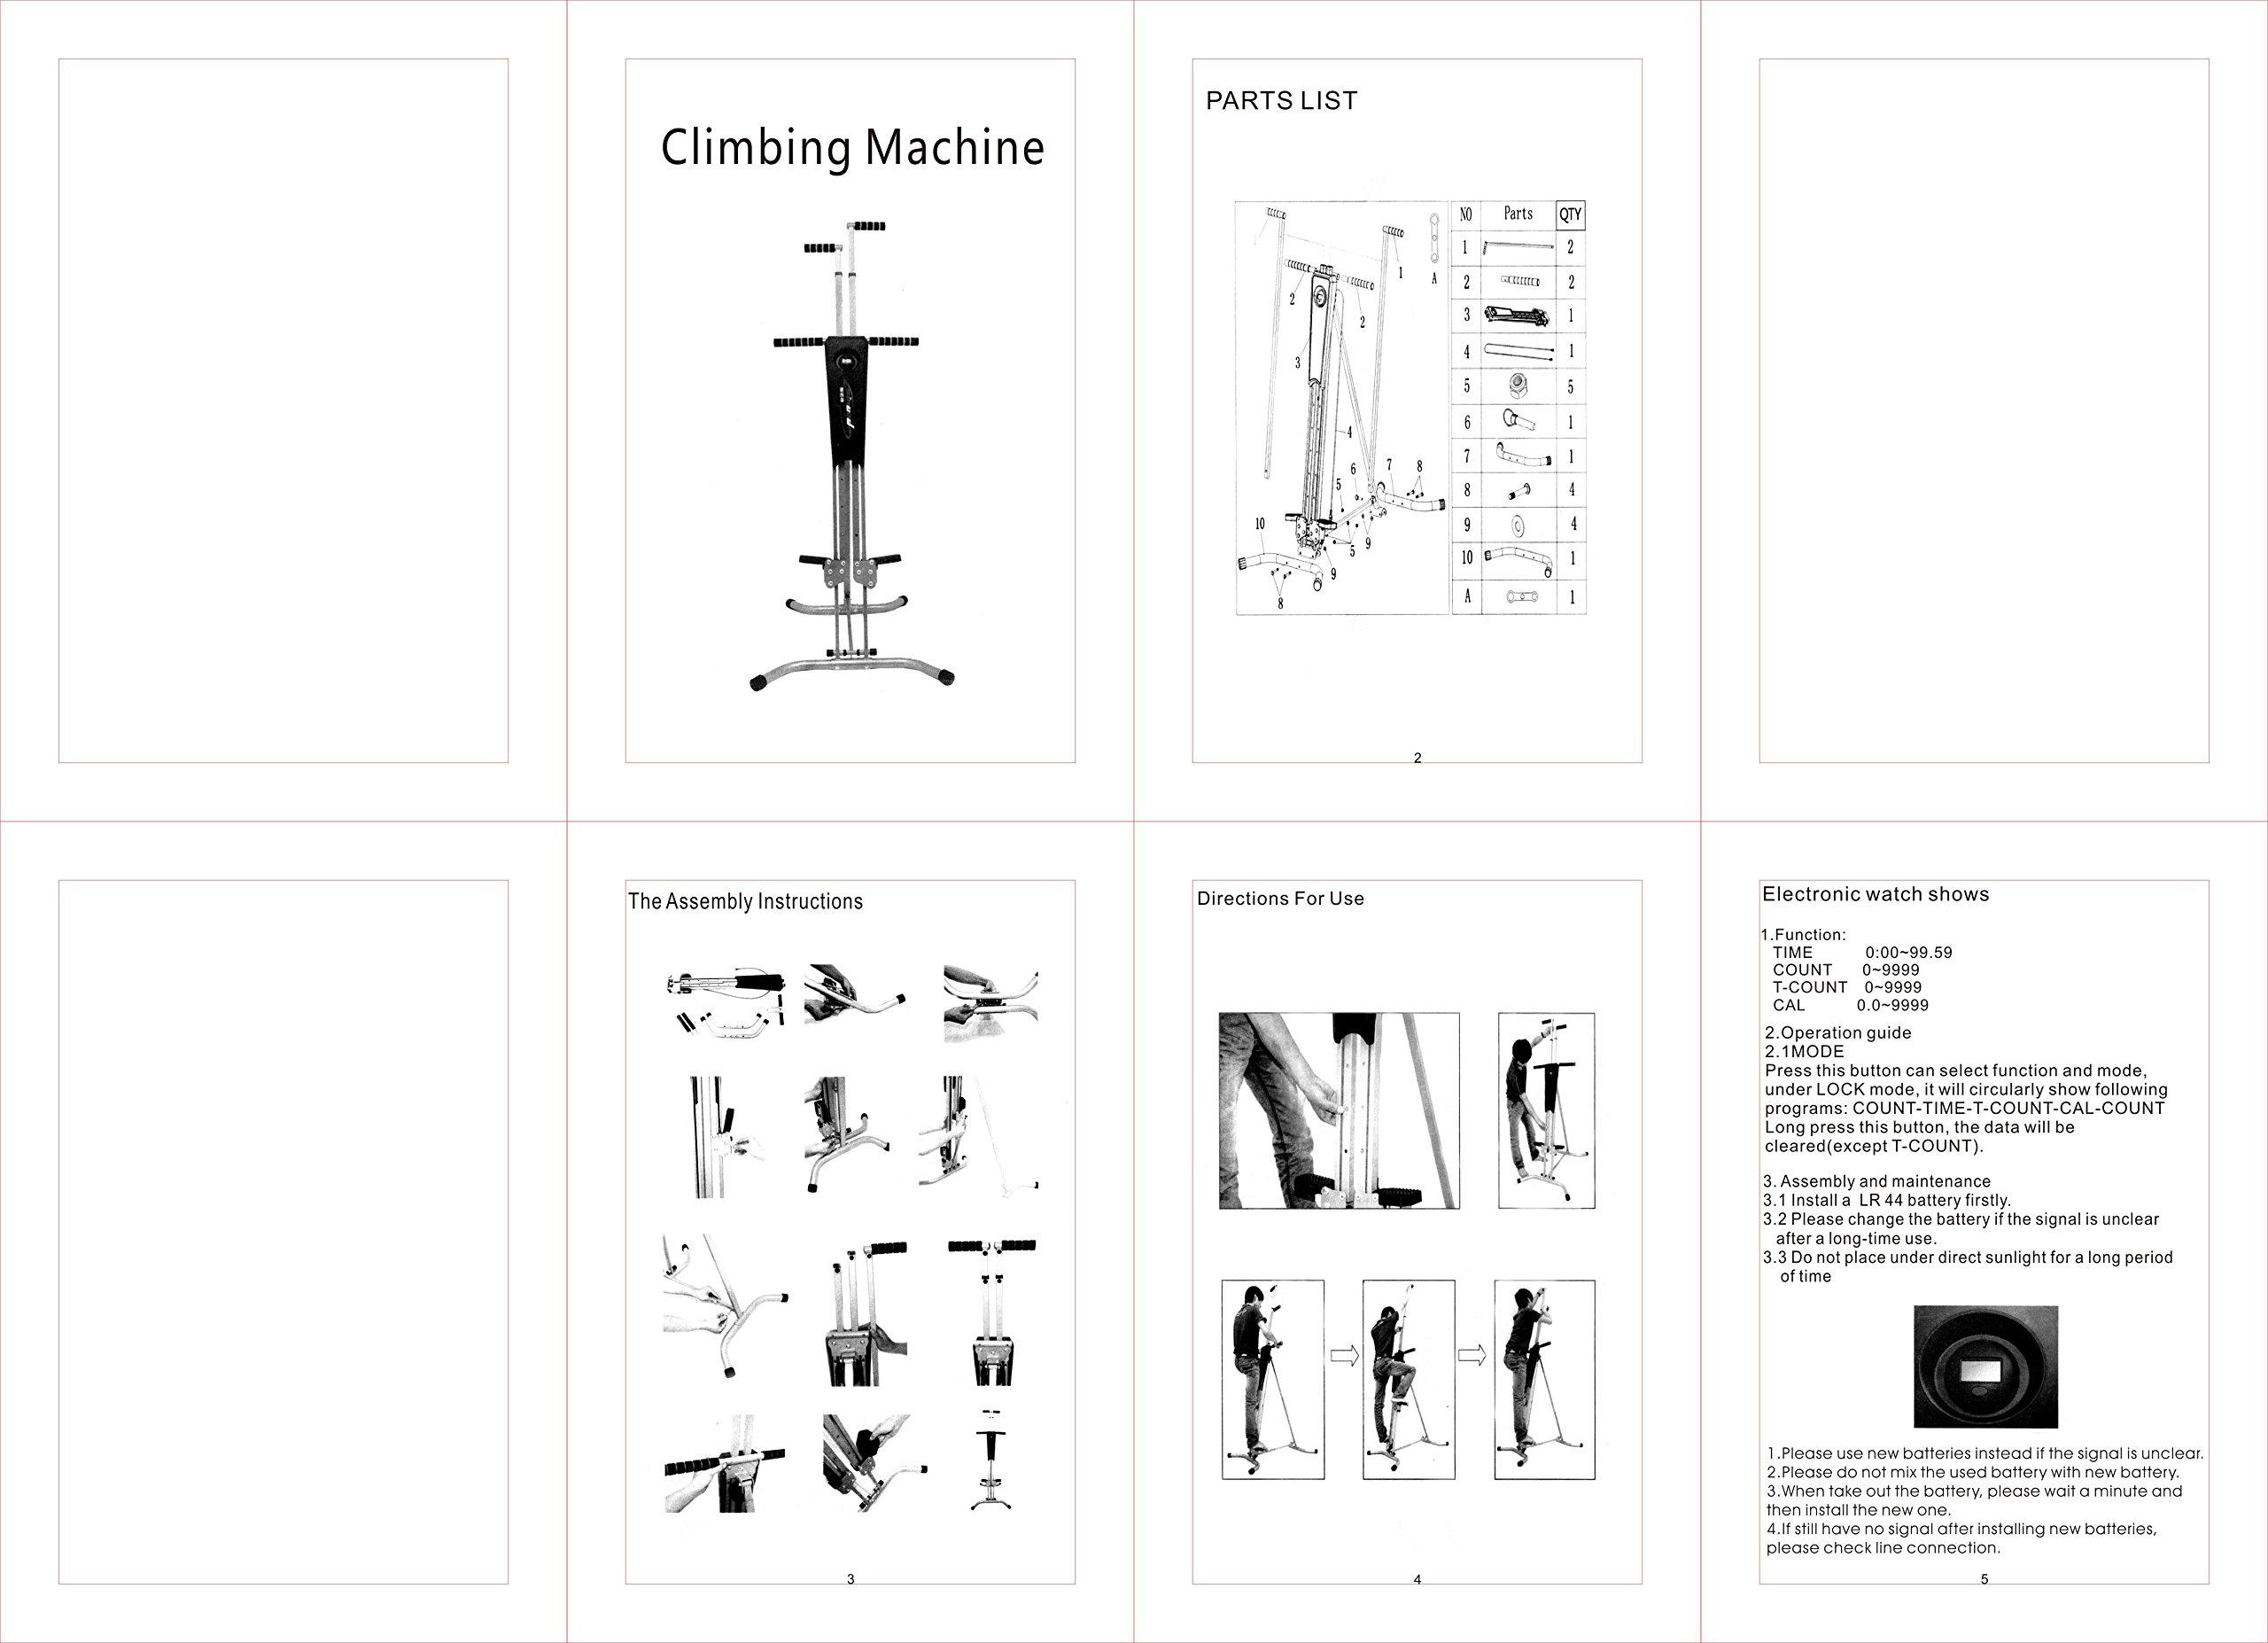 Popsport 440LBS Climber Machine Fitness Stepper Climber Exercise Equipment Vertical Climber for Home Gym Exercise Stepper Cardio Climbing System (P8006,Gray) by Popsport (Image #10)